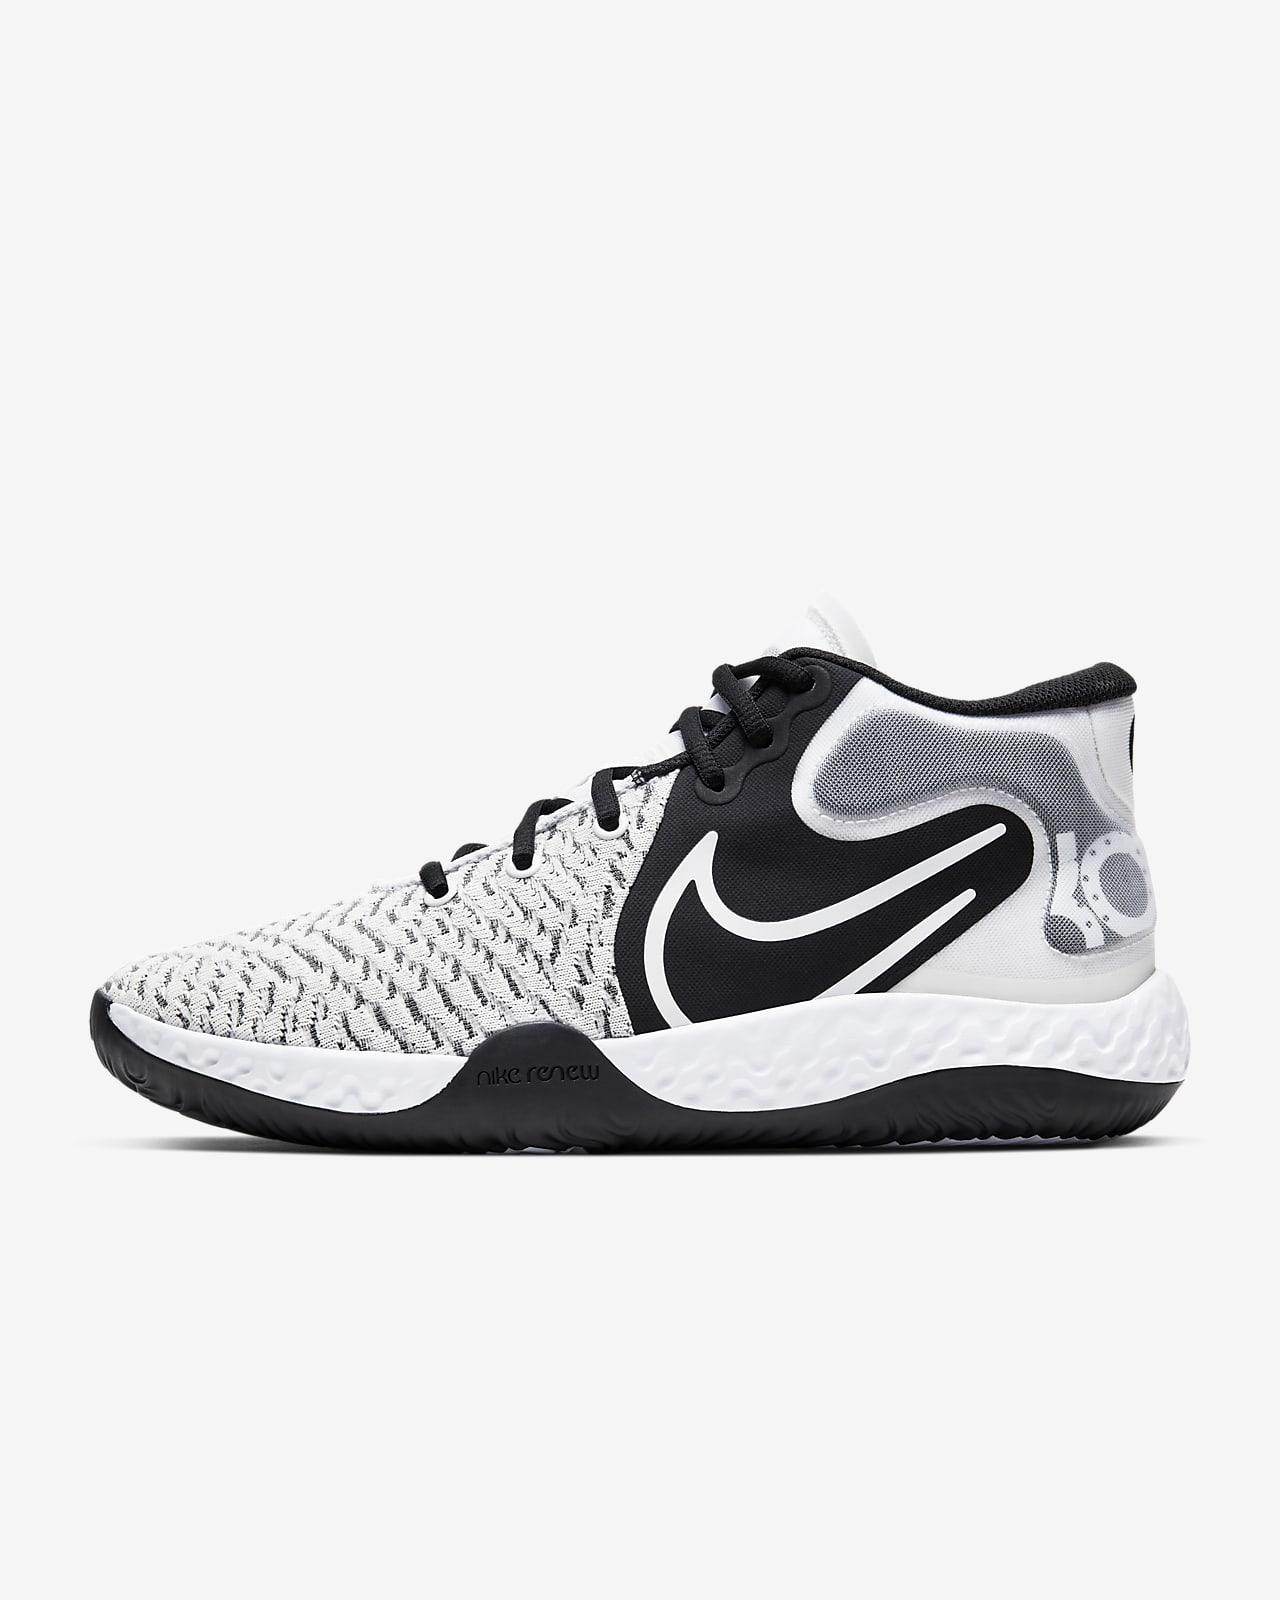 KD Trey 5 VIII EP Basketball Shoe. Nike JP